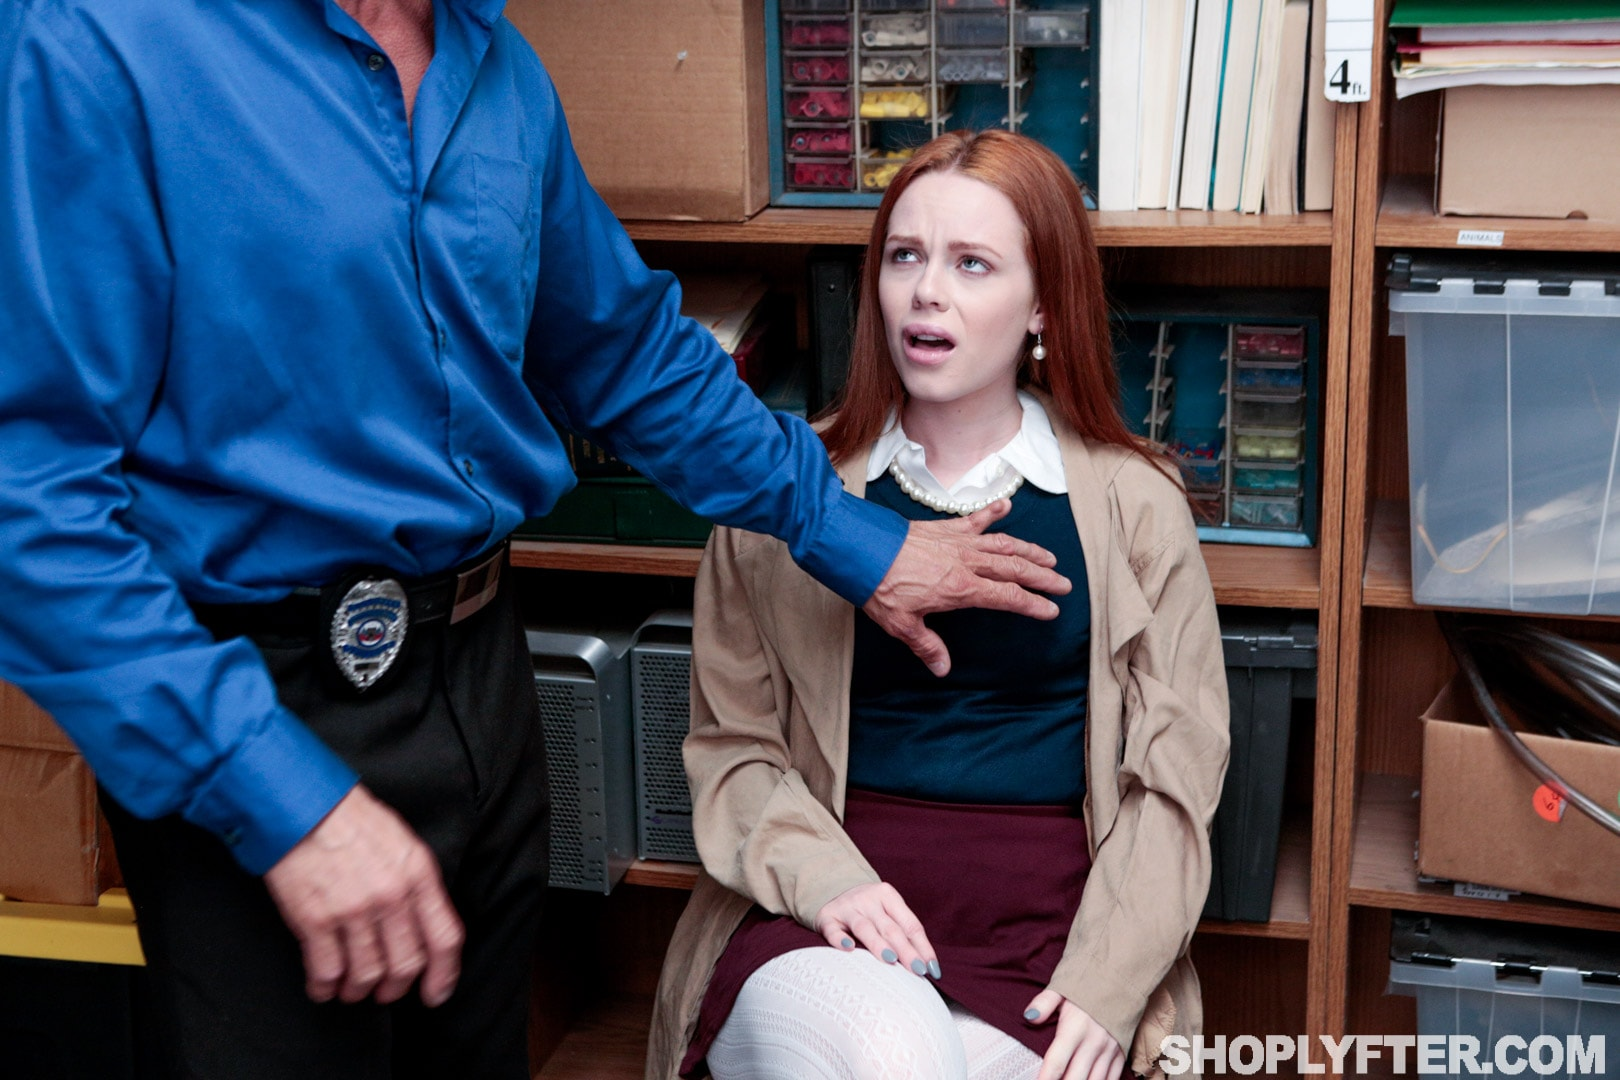 Team Skeet 'Case No. 5144158' starring Ella Hughes (Photo 18)